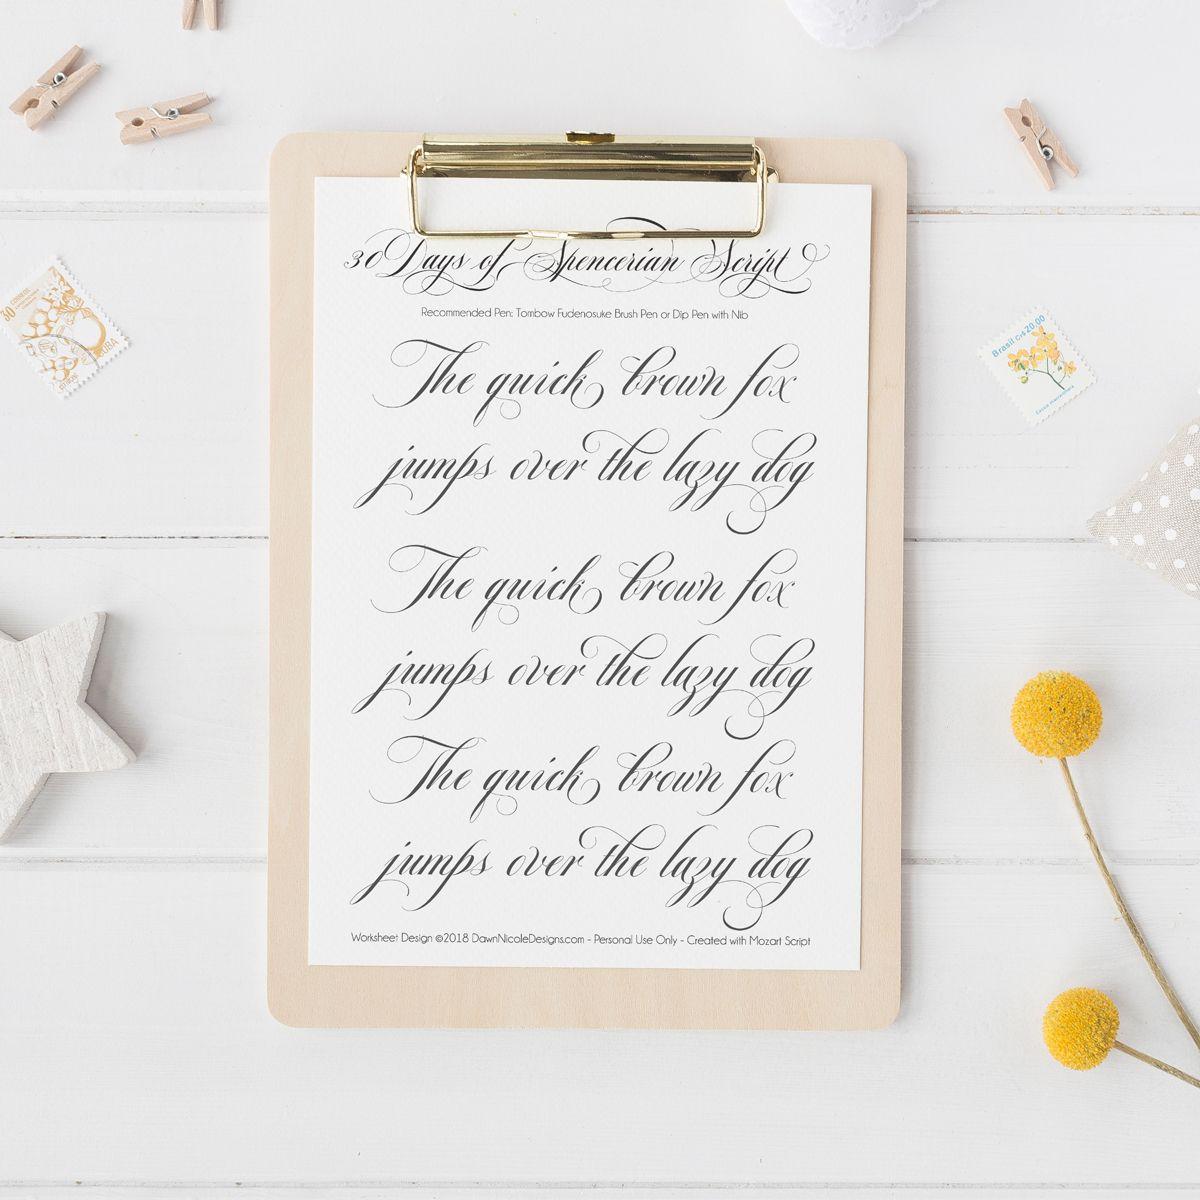 Spencerian Script Style Pangram Worksheets By Dawn